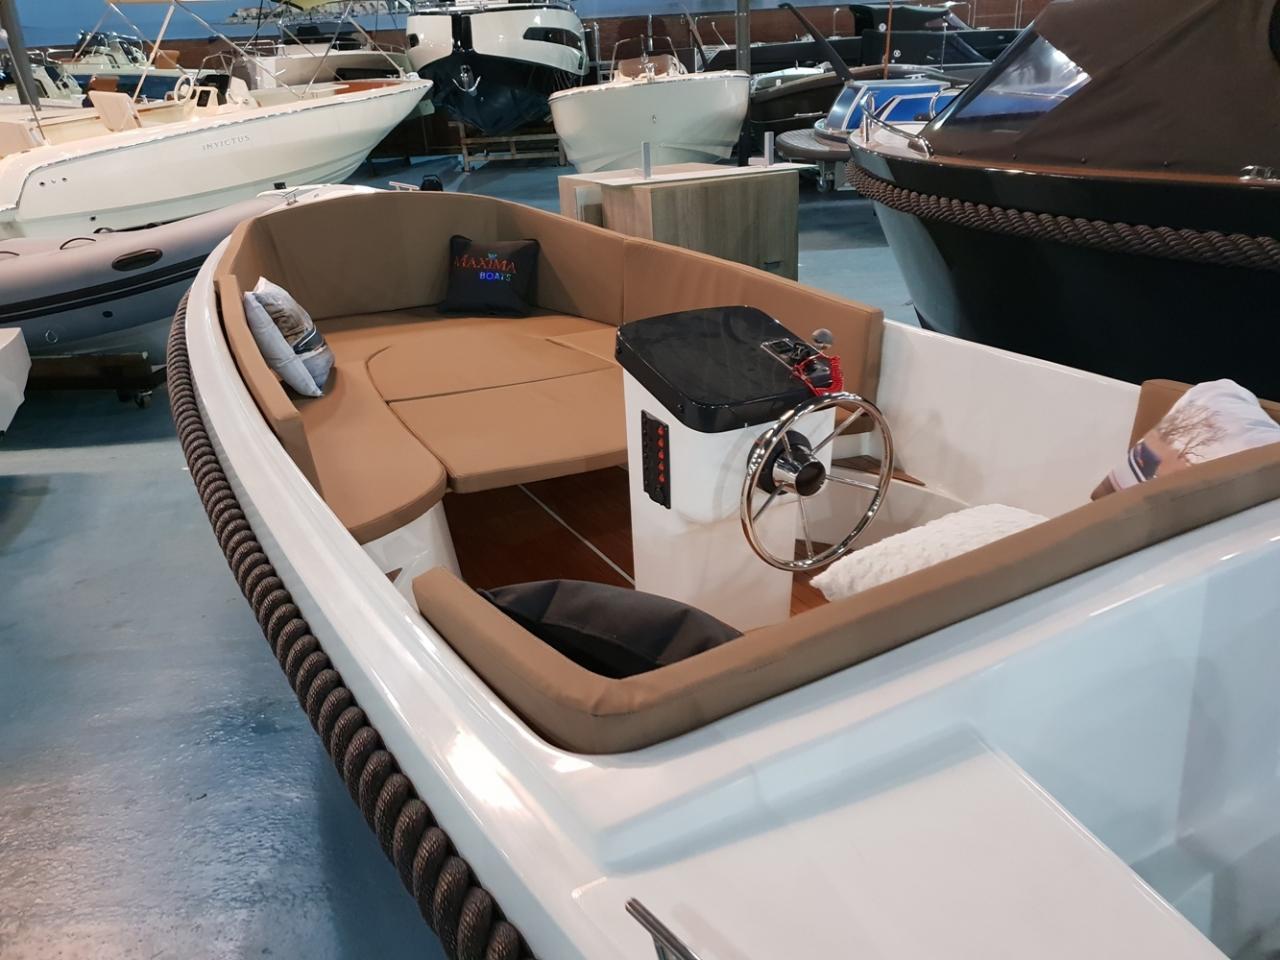 Maxima 485 met 10 pk Honda outboard motor 5